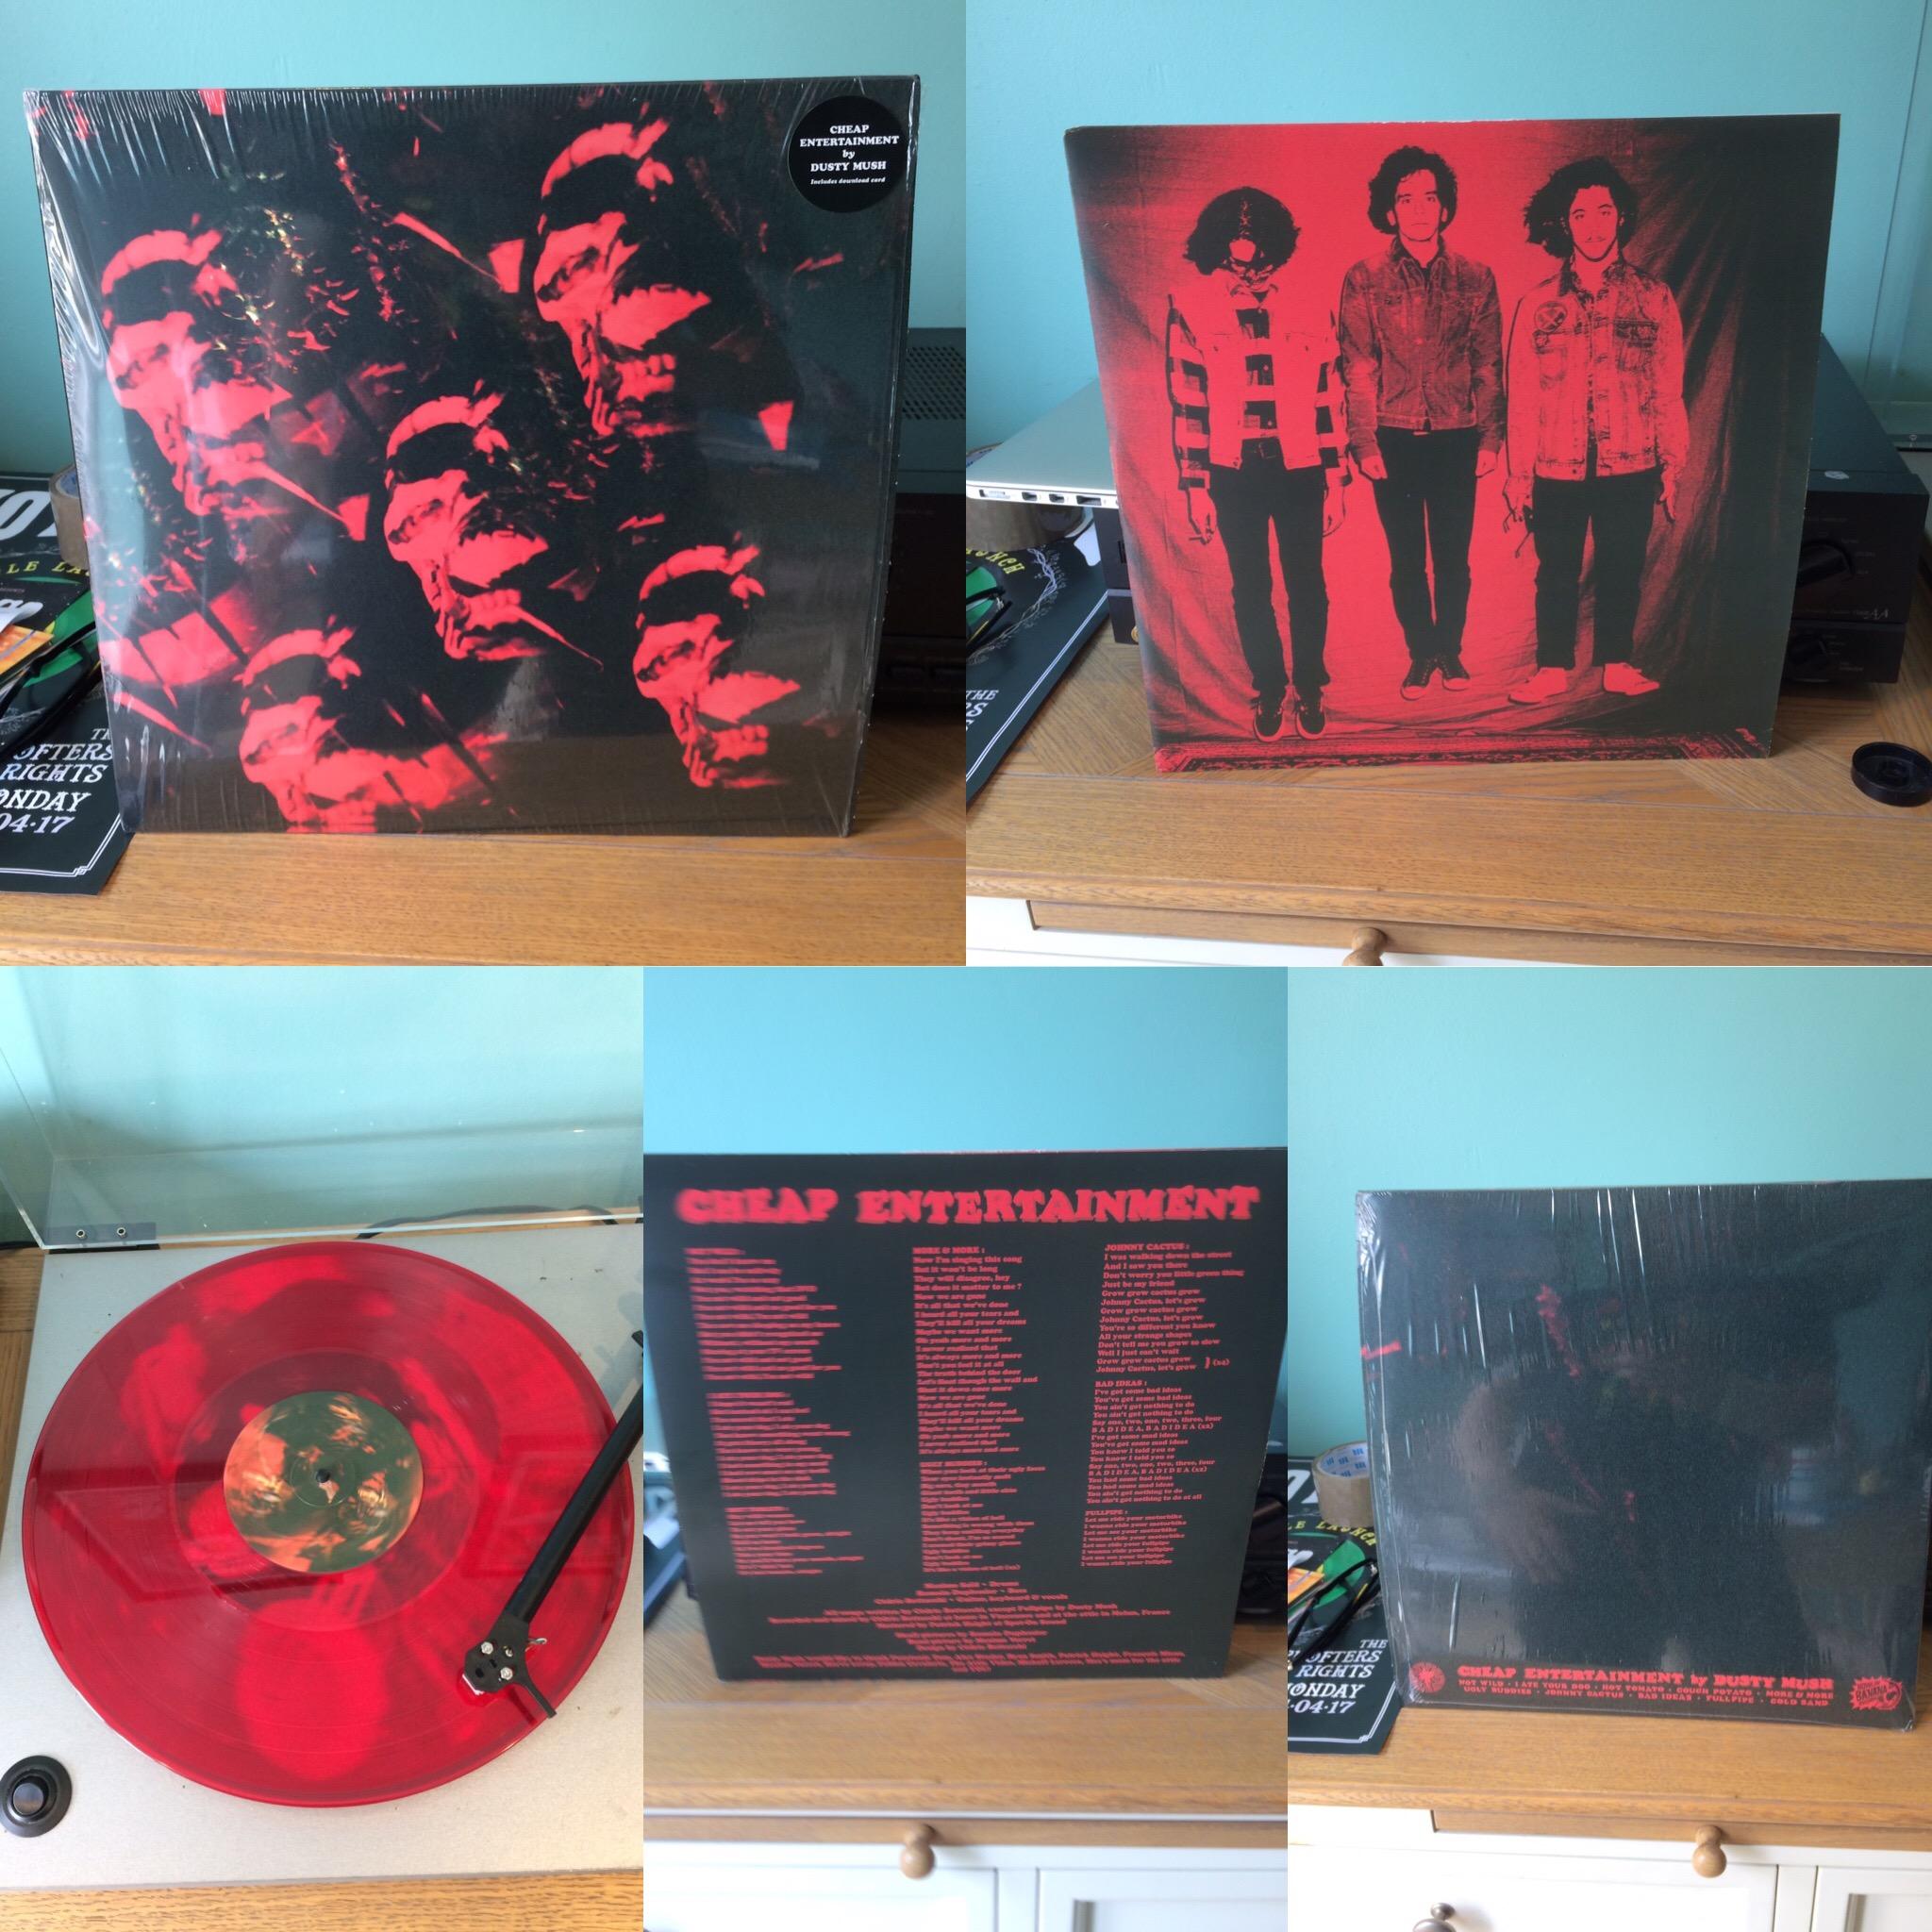 Dusty Mush - Cheap Entertainment Red Vinyl